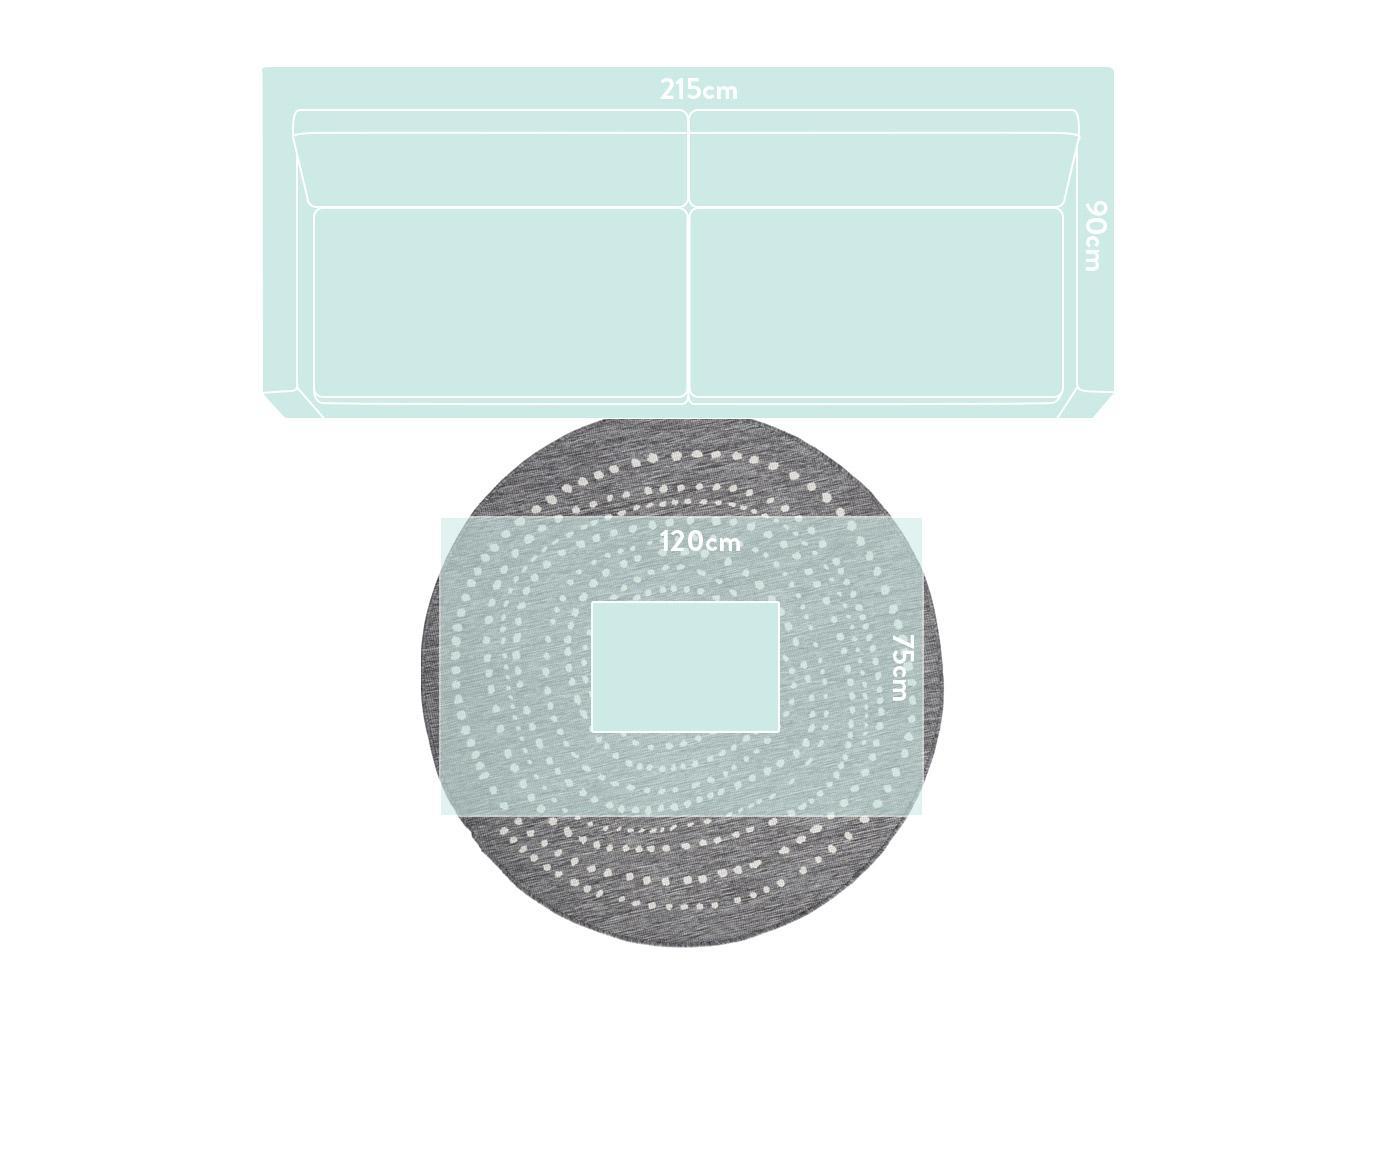 Alfombra redonda reversible de interior/exterior Bali, Gris, crema, Ø 140 cm (Tamaño M)